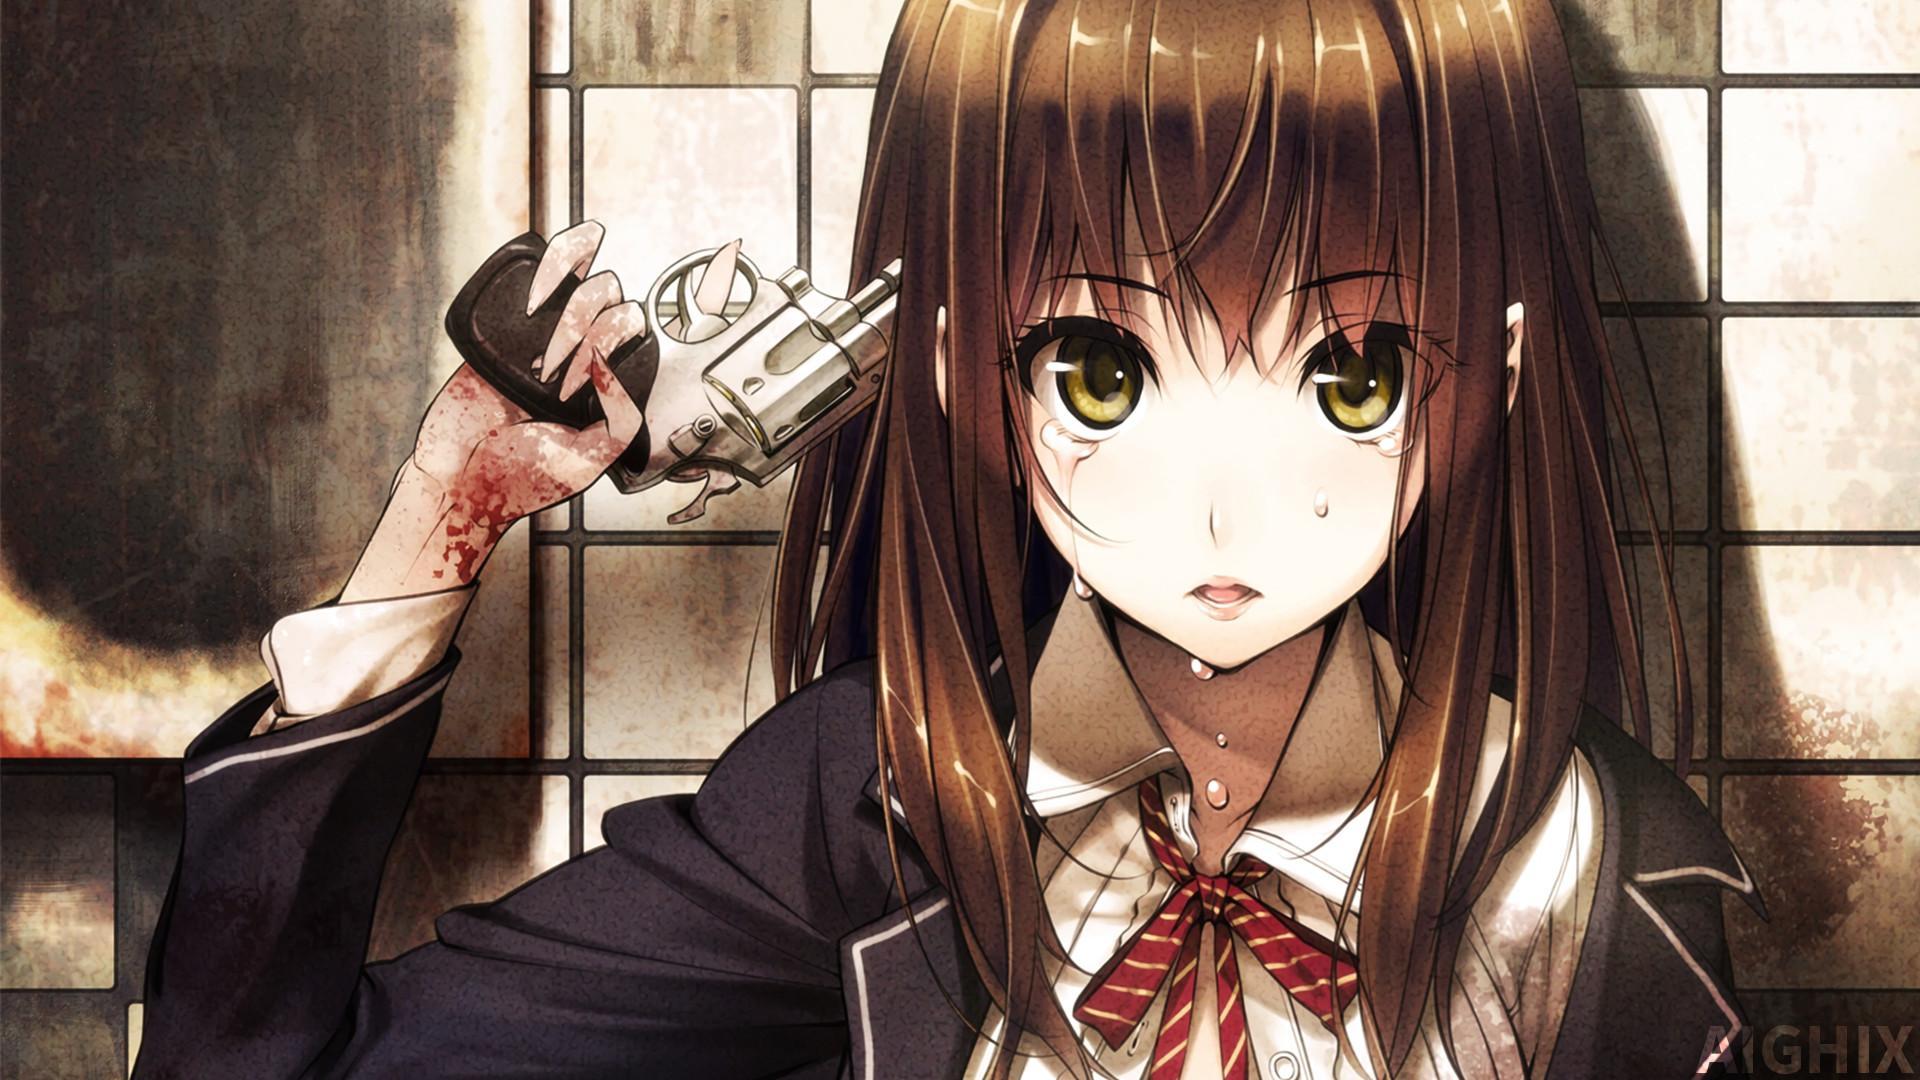 Sad Alone Anime Girl Desktop Wallpapers - Wallpaper Cave